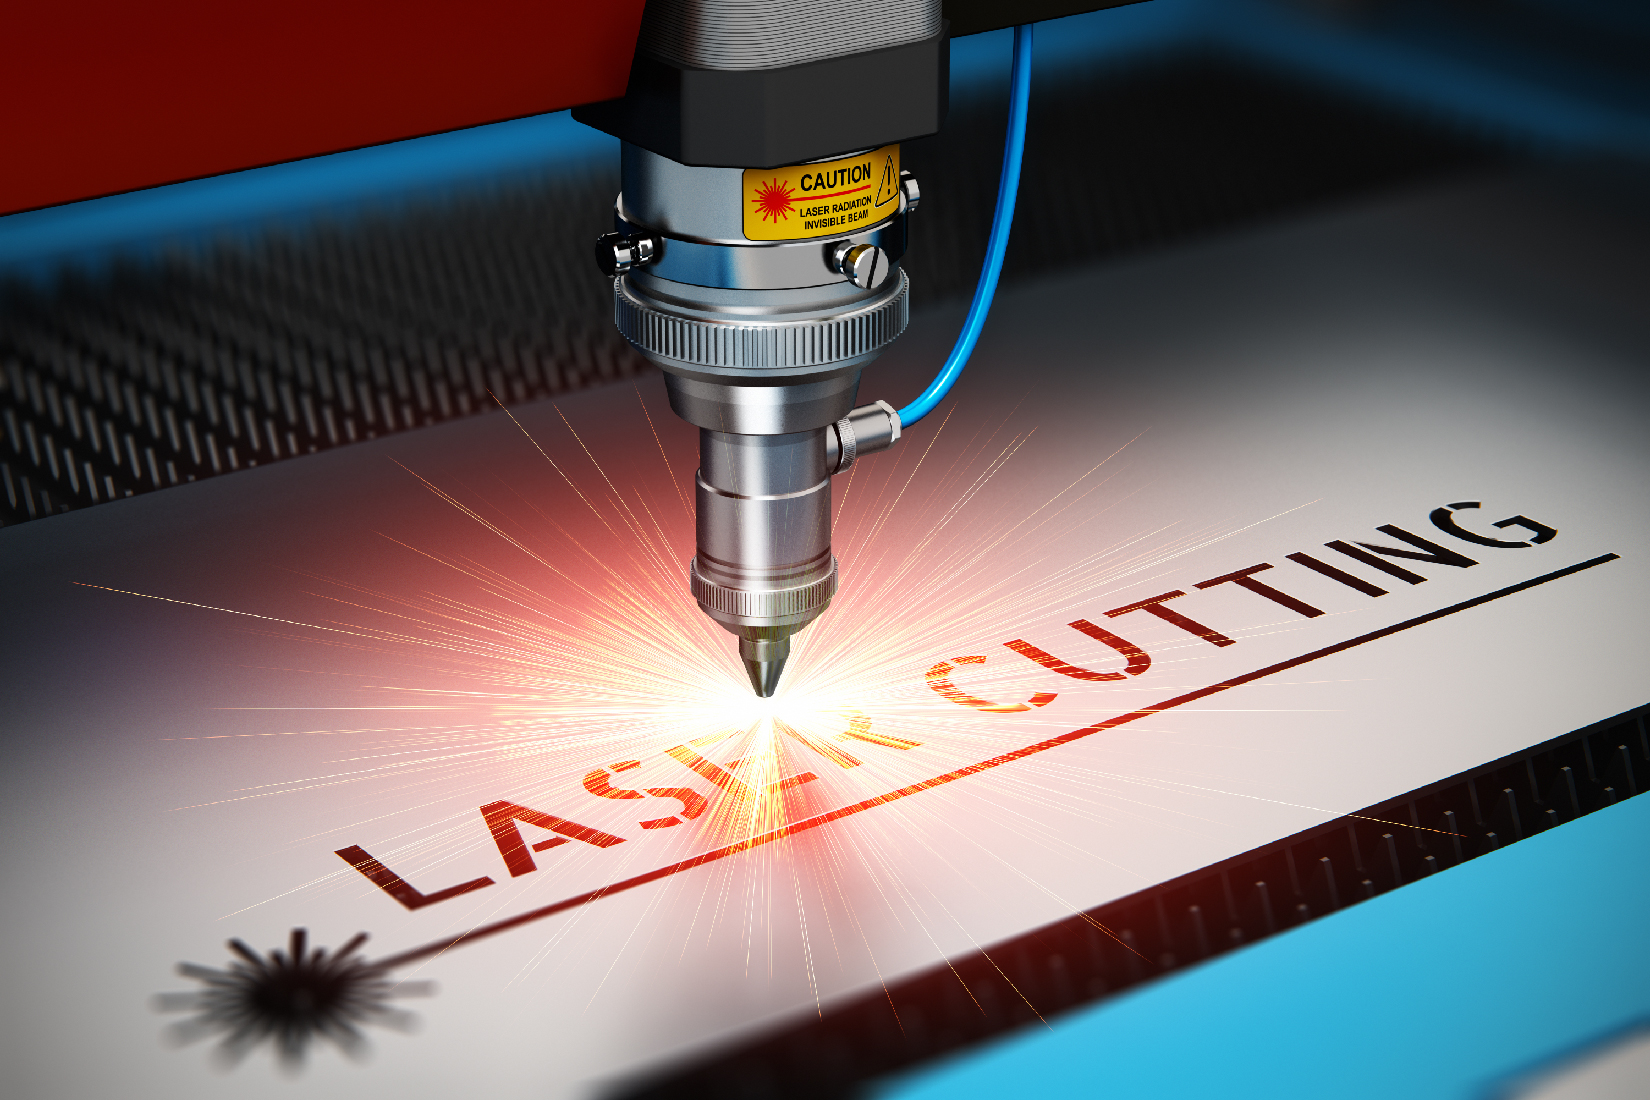 & Marketing-Laser Cut-Laser Engraving-North Carolina-Virginia-USA